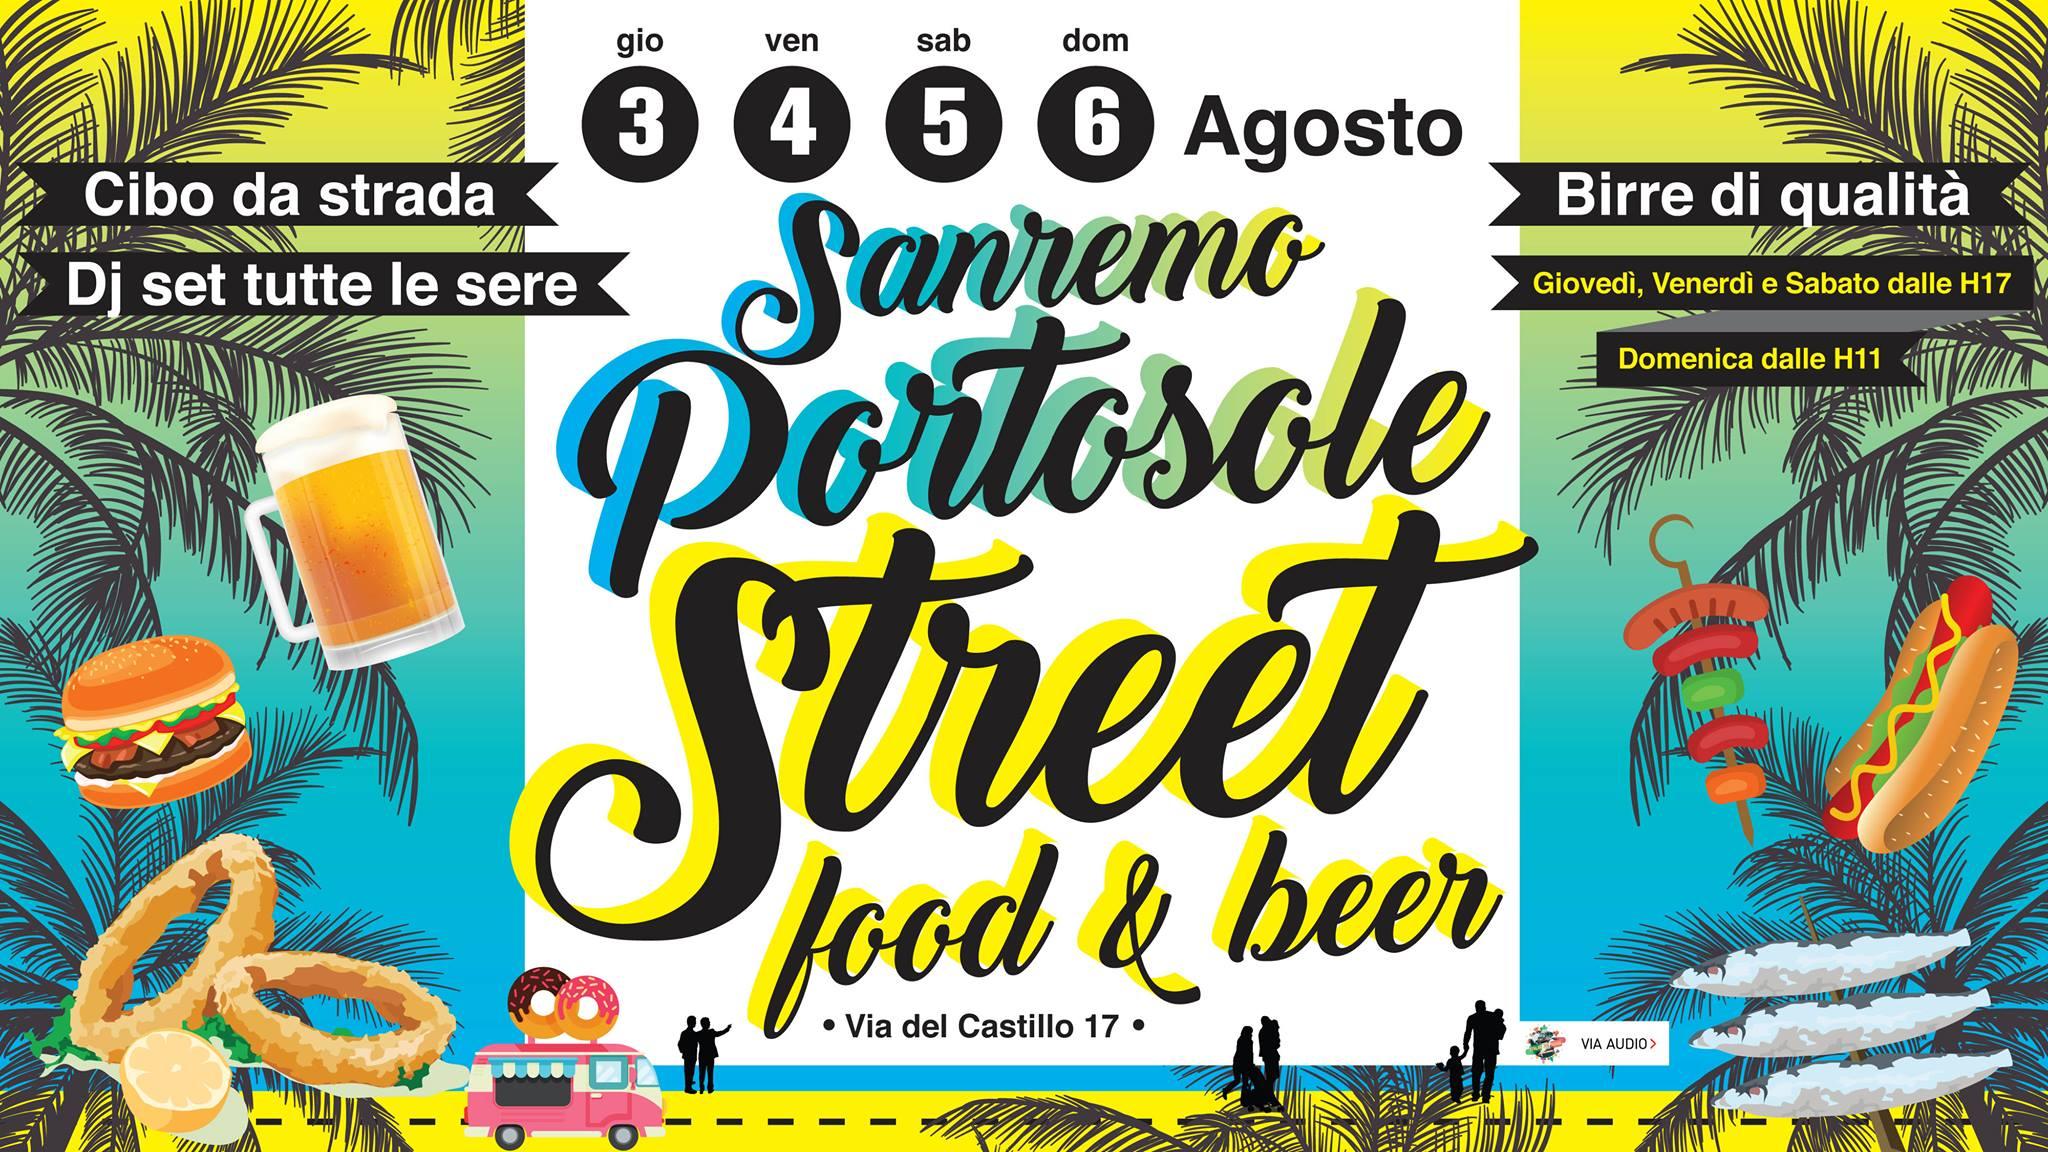 Street Food Portosole